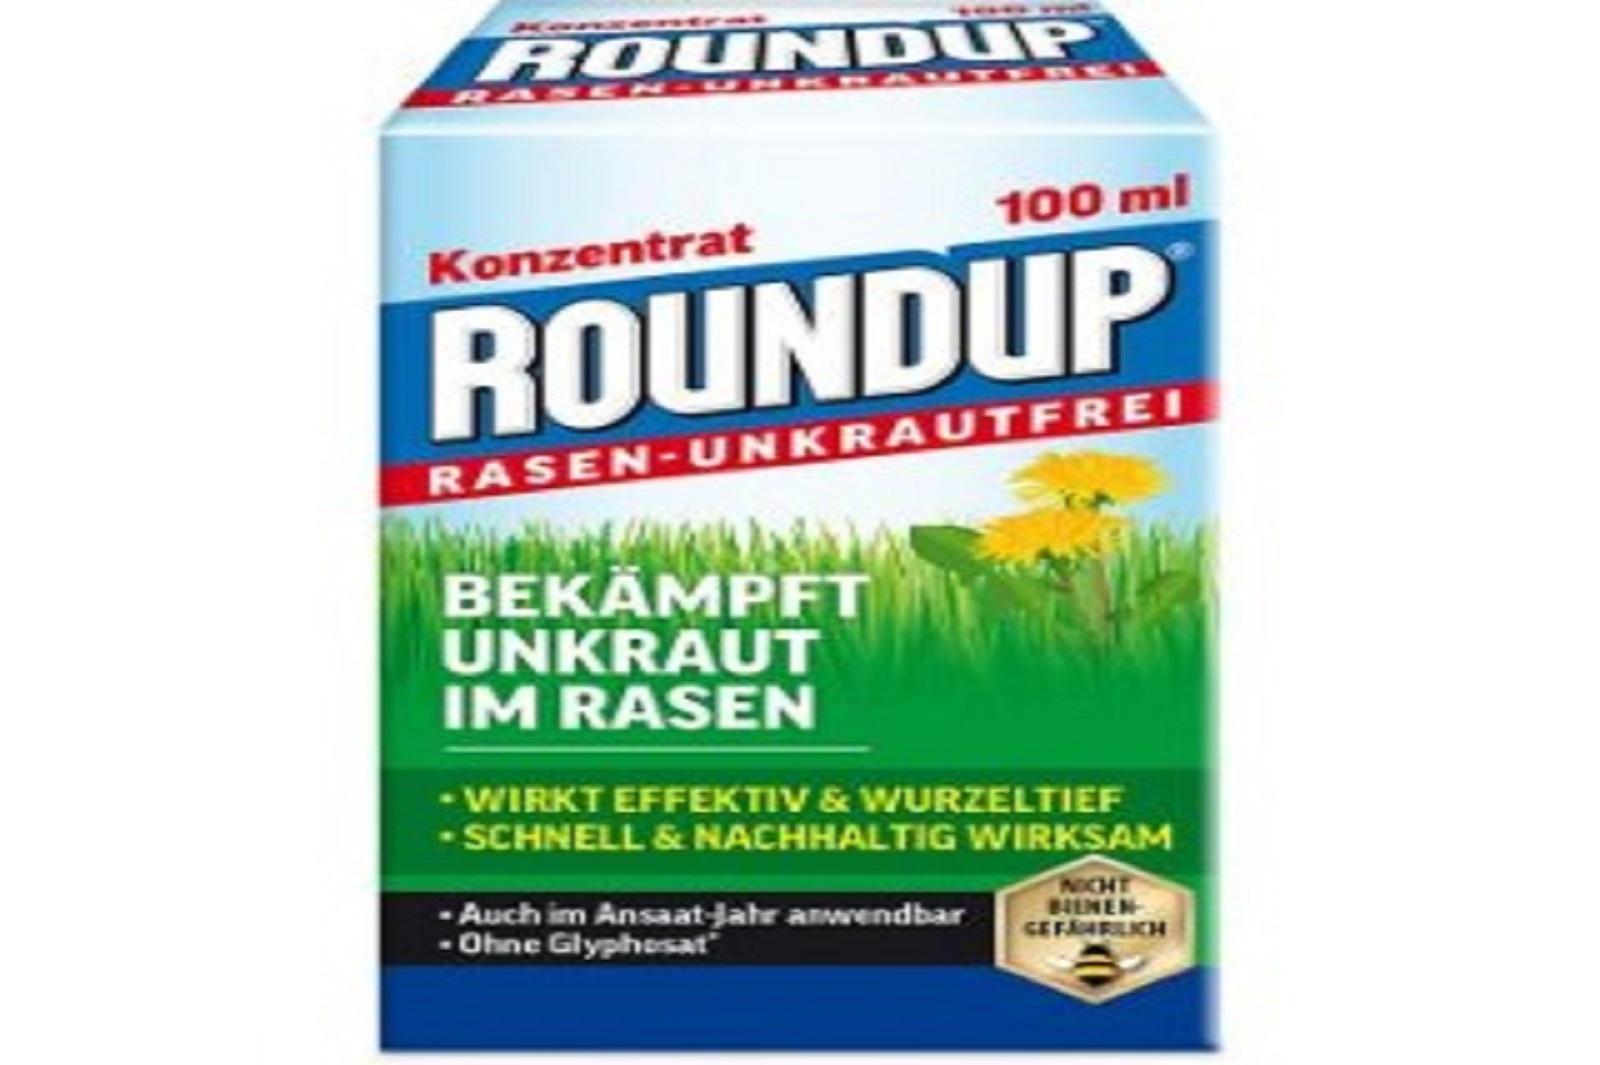 Celaflor Rasen Unkrautfrei Round up Konzentra´t (Nachf. v. Anicon Ultra) 100 ml